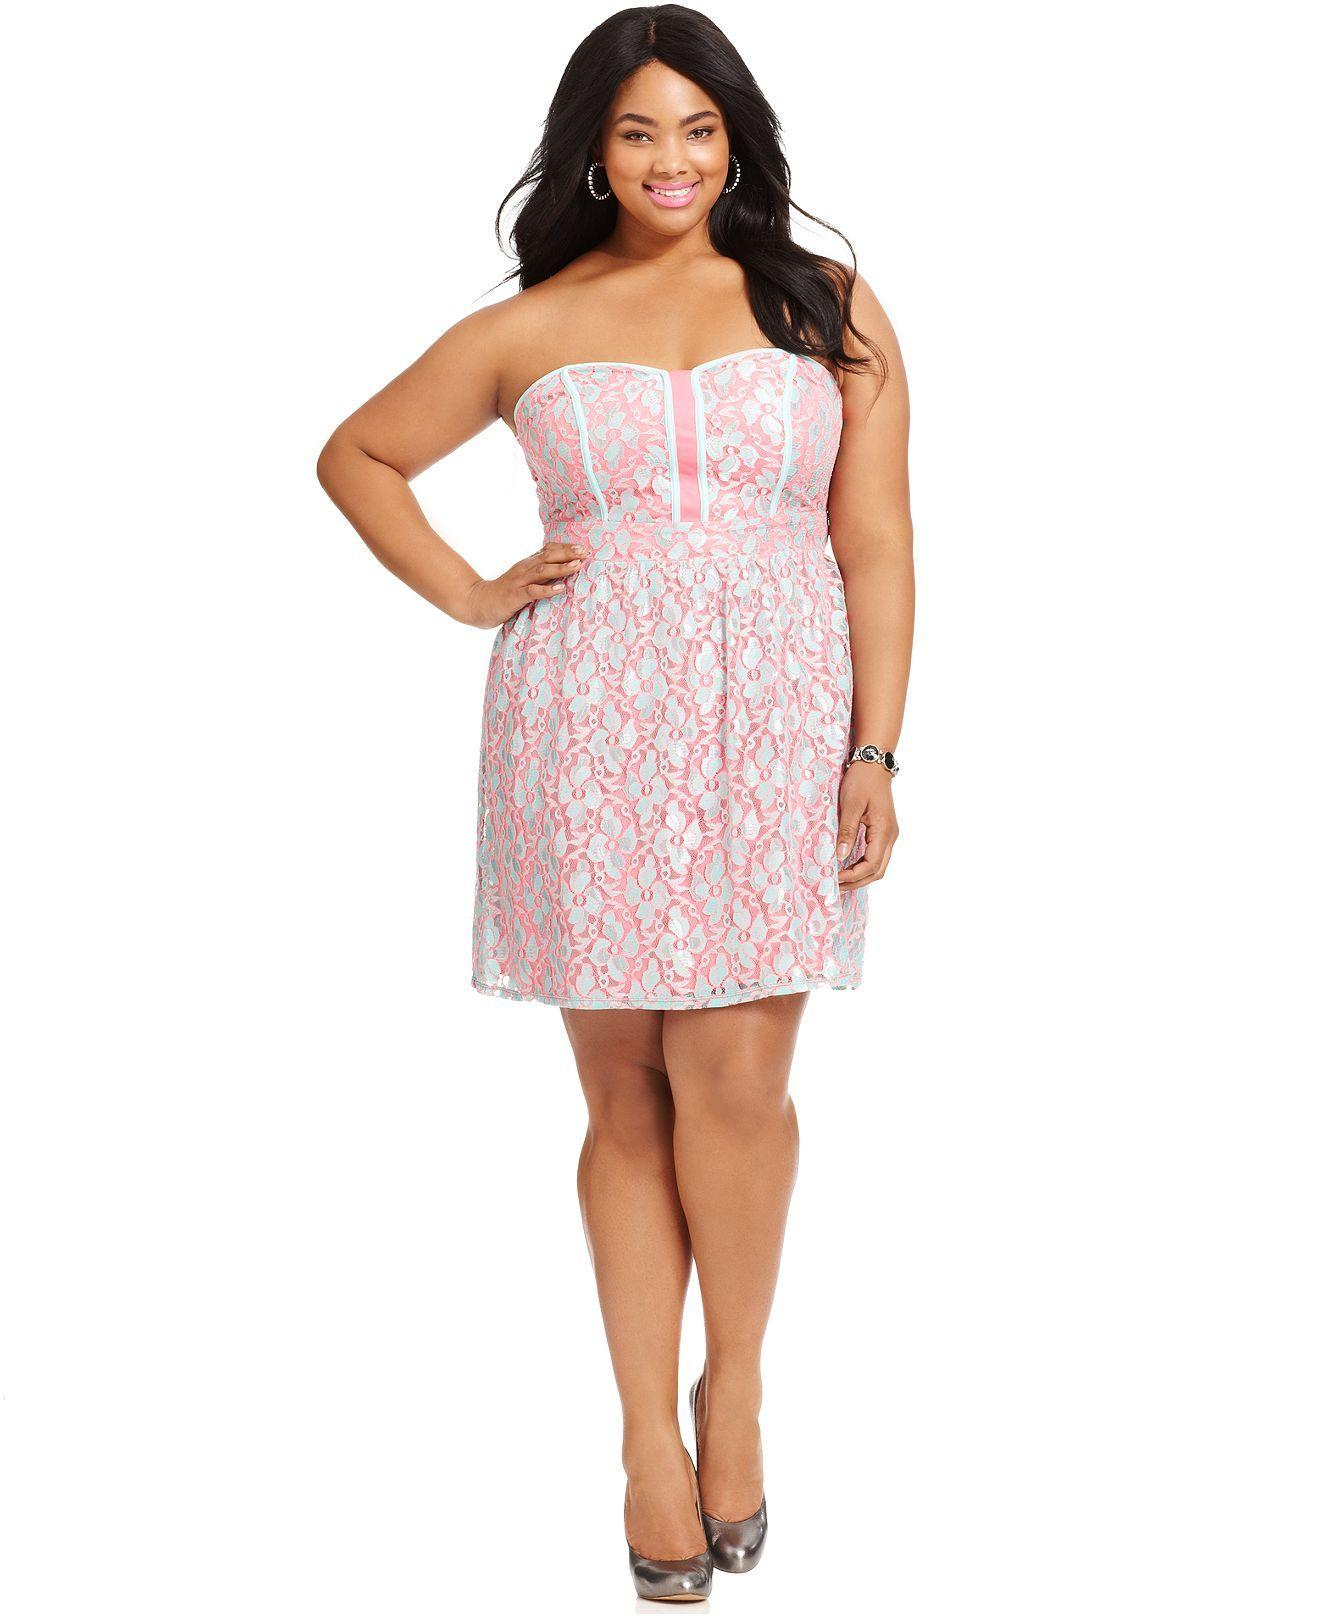 Ruby Rox Plus Size Dress, Strapless Lace A-Line - Plus Size ...